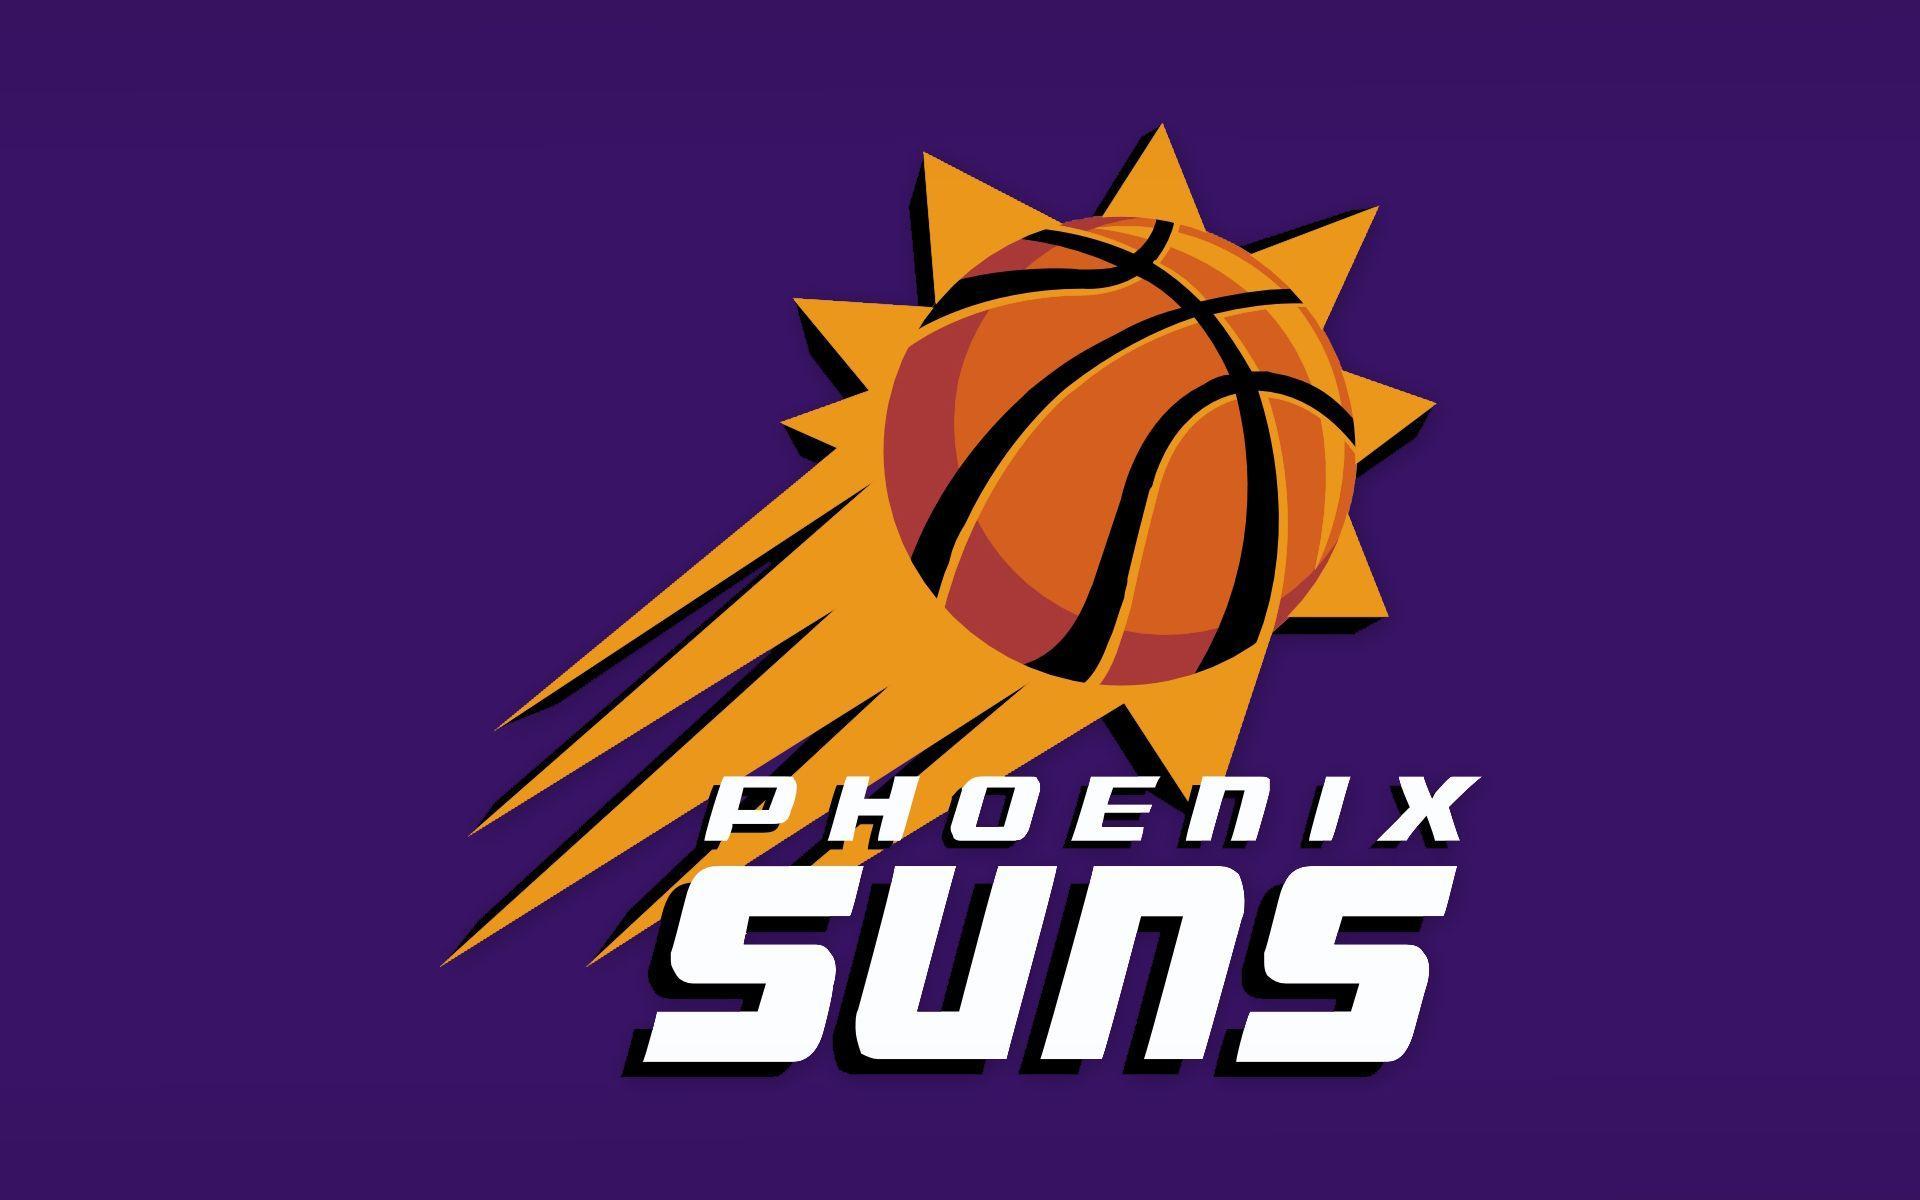 Suns Logo Wallpapers   Top Suns Logo Backgrounds 1920x1200